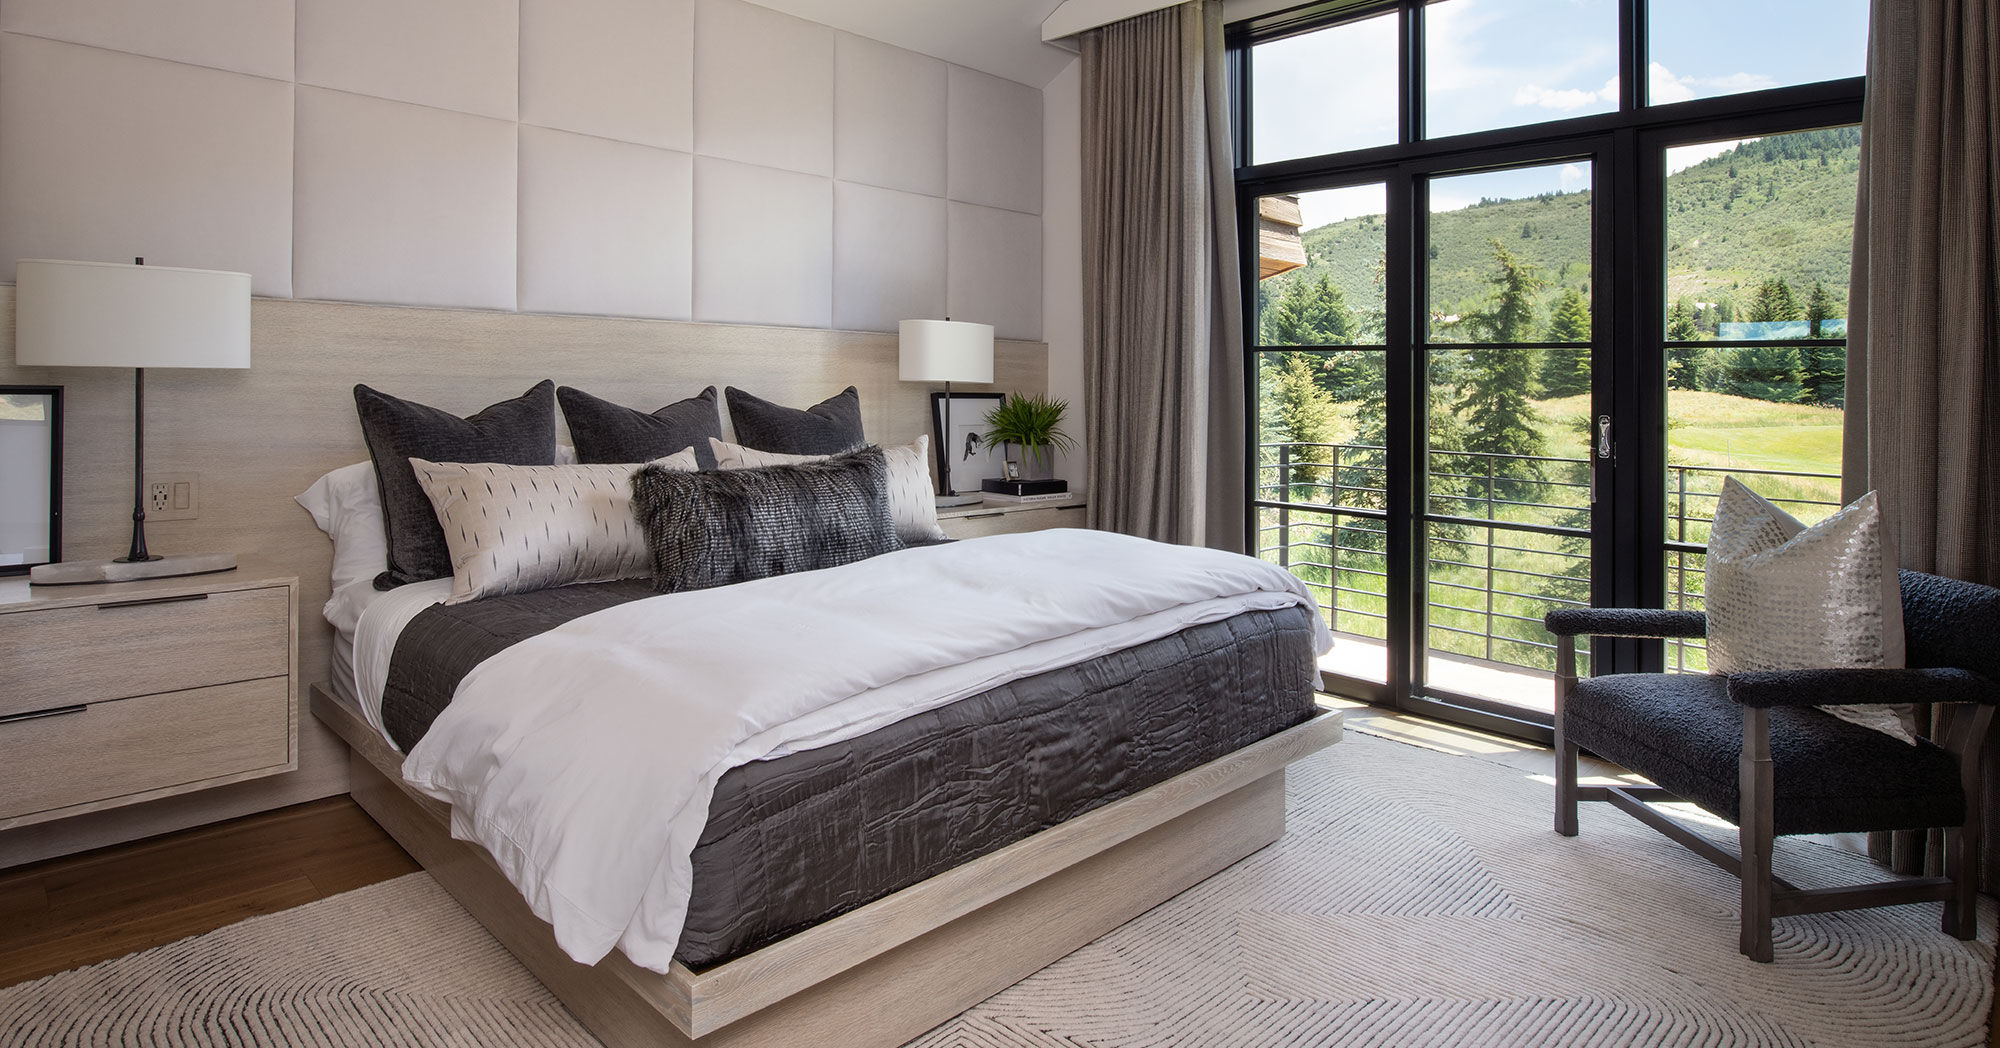 Master Bedroom Luxury Golf Course Edwards CO